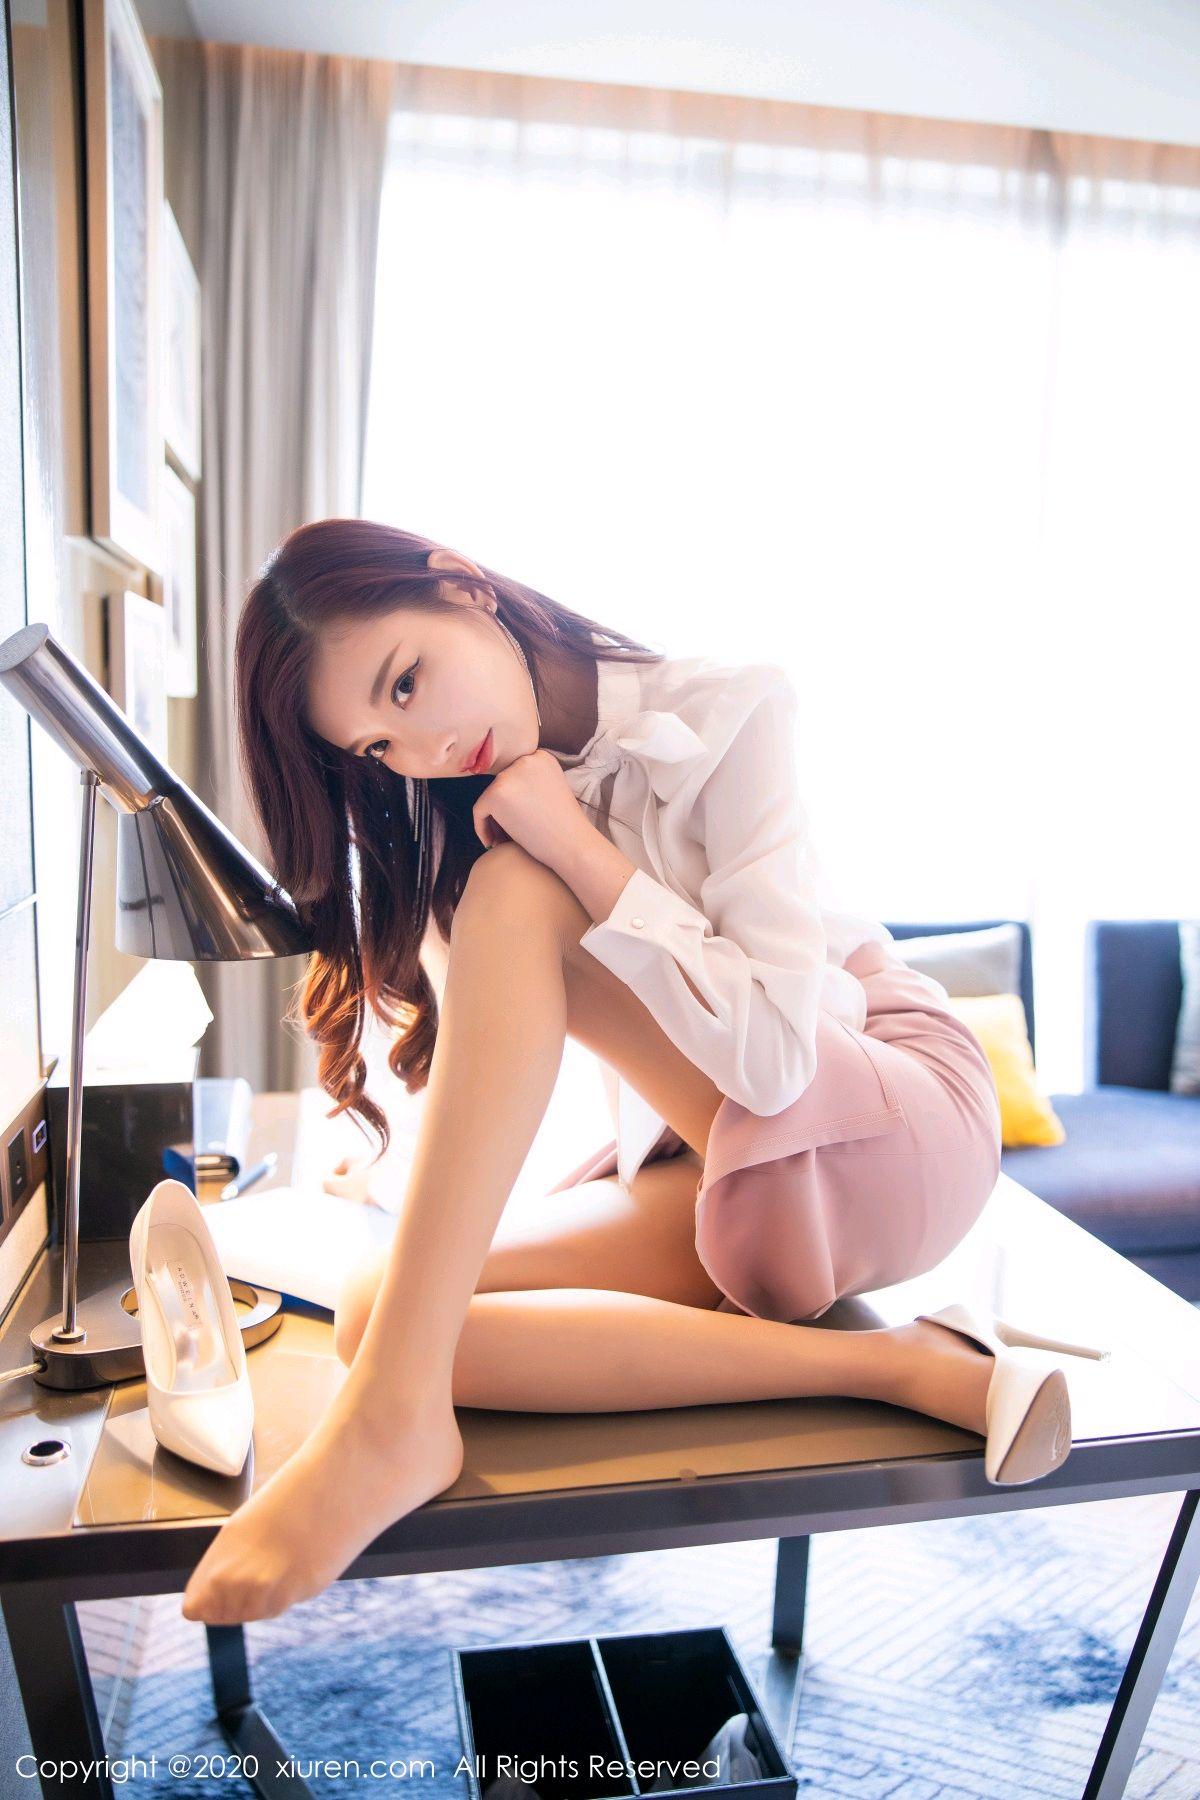 [XiuRen] Vol.2431 Yang Chen Chen 28P, Tall, Underwear, Uniform, Xiuren, Yang Chen Chen